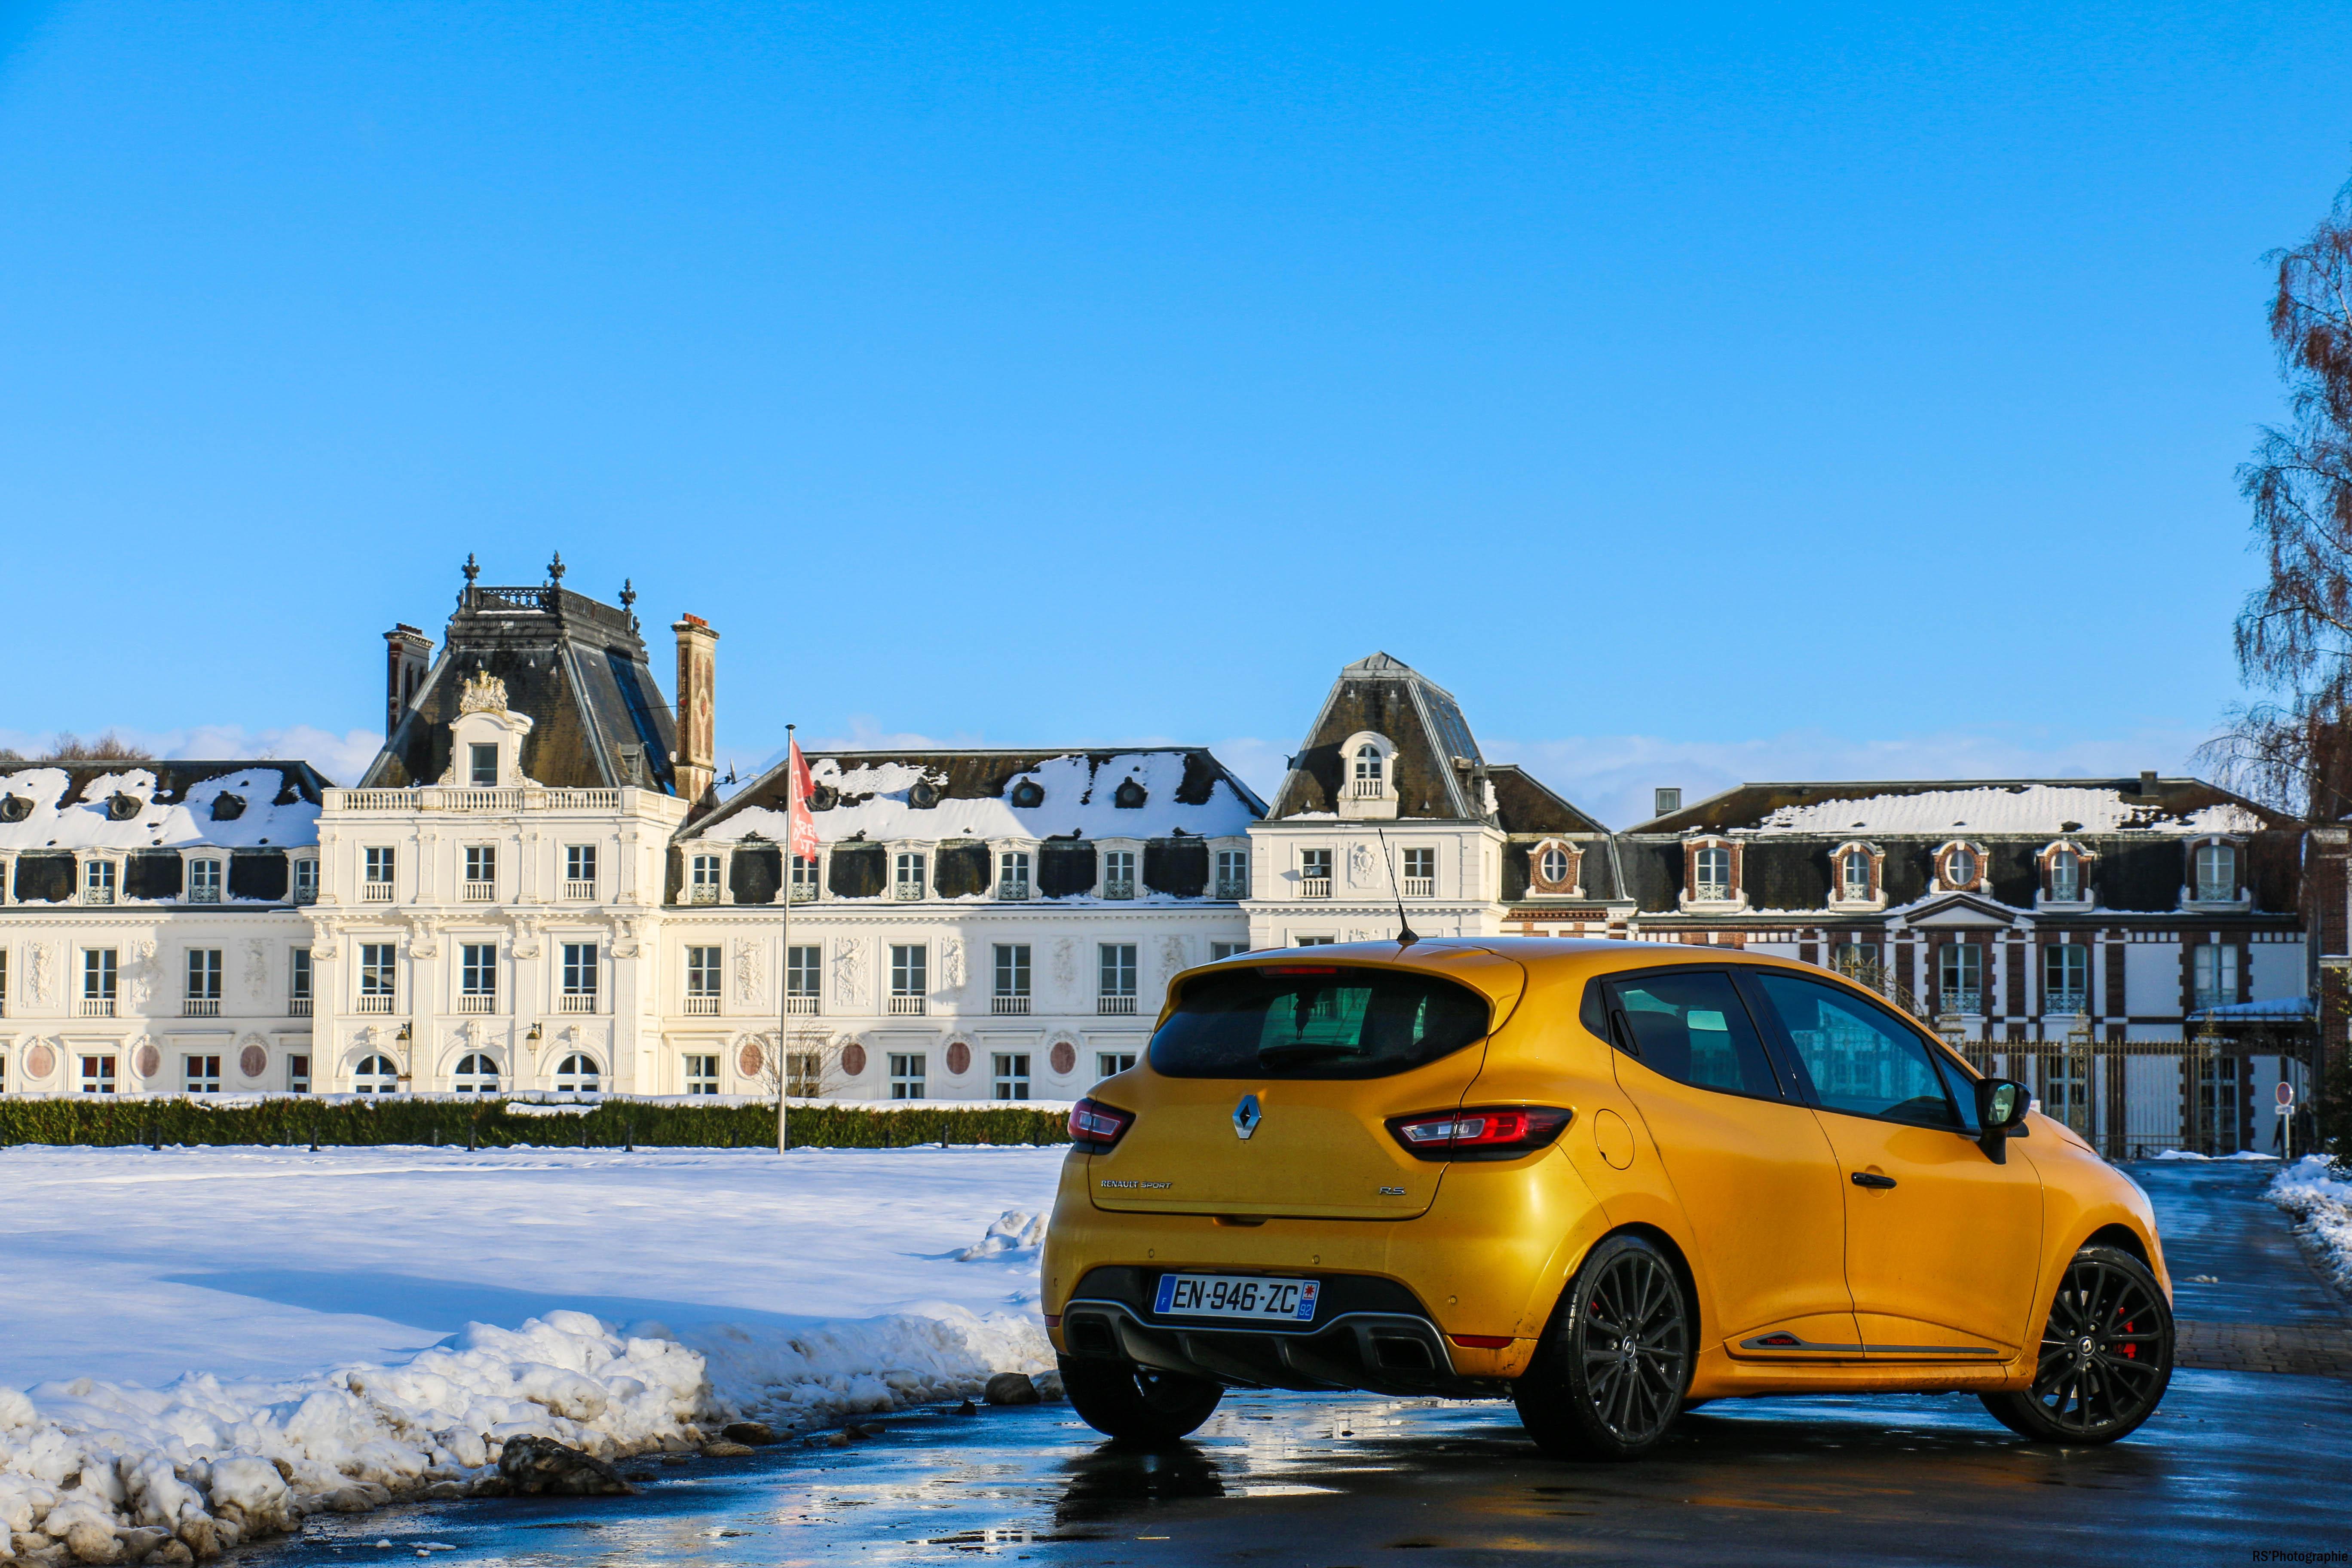 RenaultclioIVRSTrophy11-renault-clio-RS-trophy-arriere-rear-Arnaud Demasier-RSPhotographie